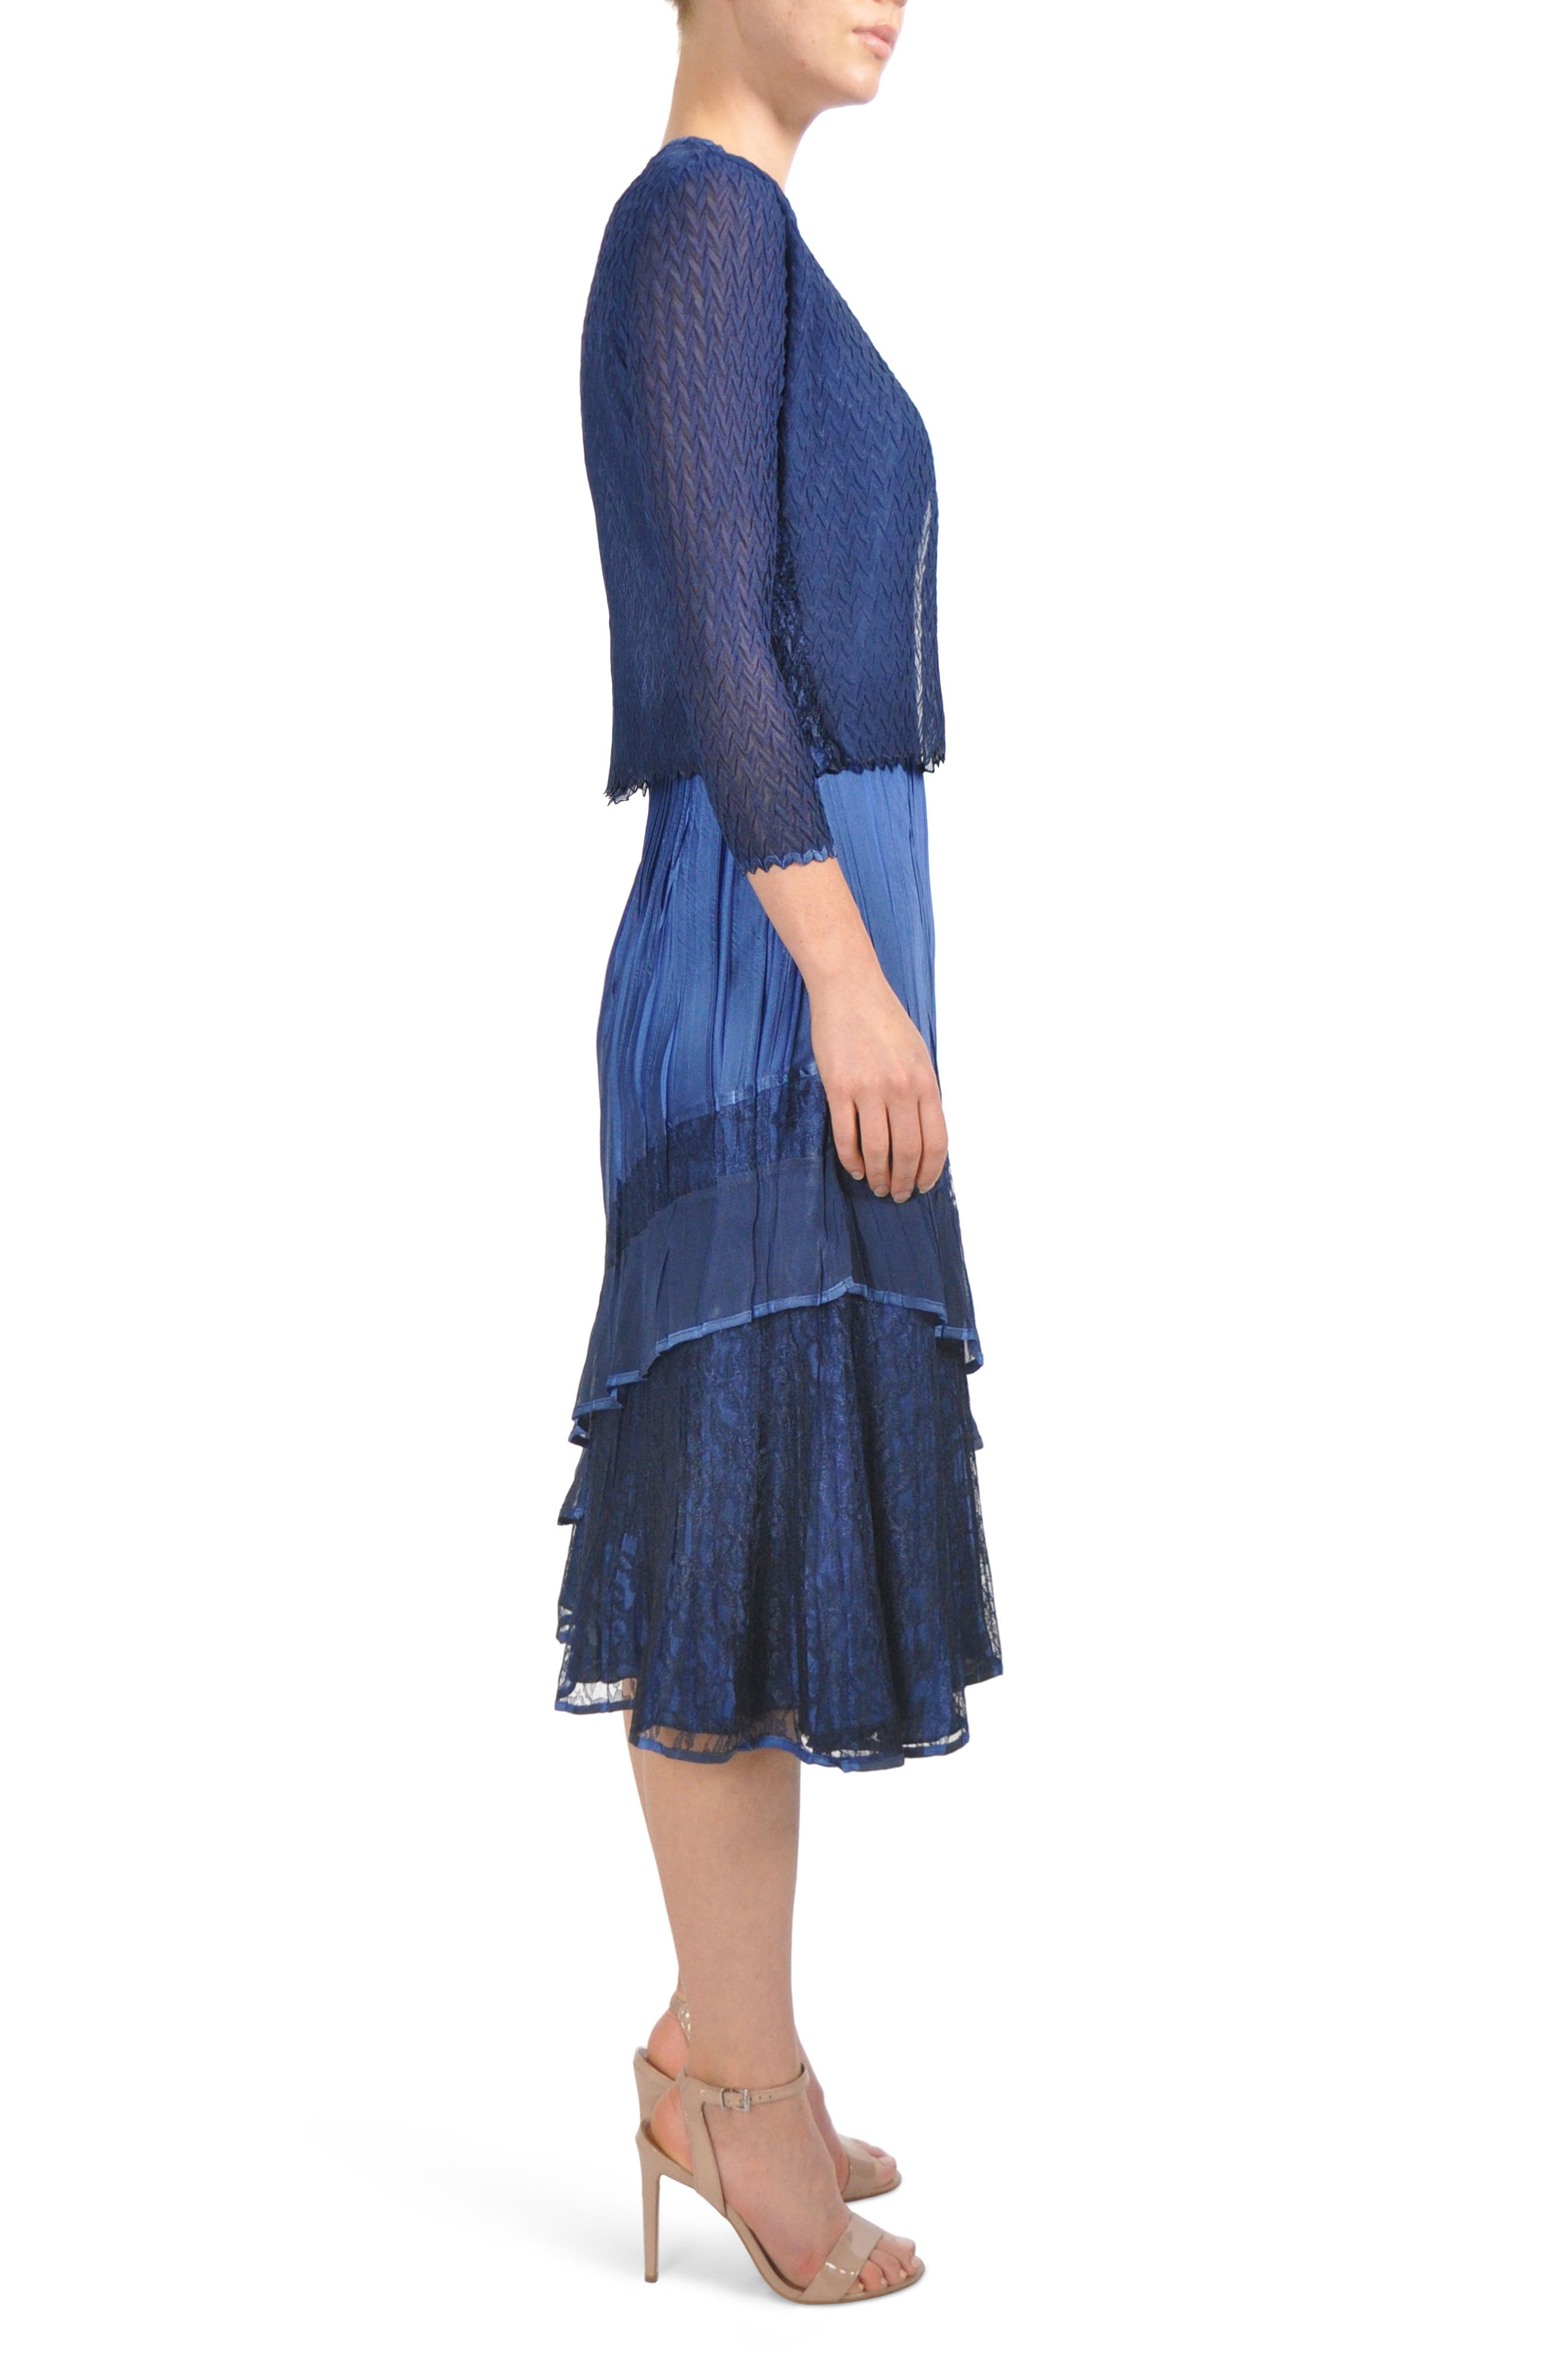 Komorov Midi Dress with Jacket,                             Alternate thumbnail 4, color,                             484